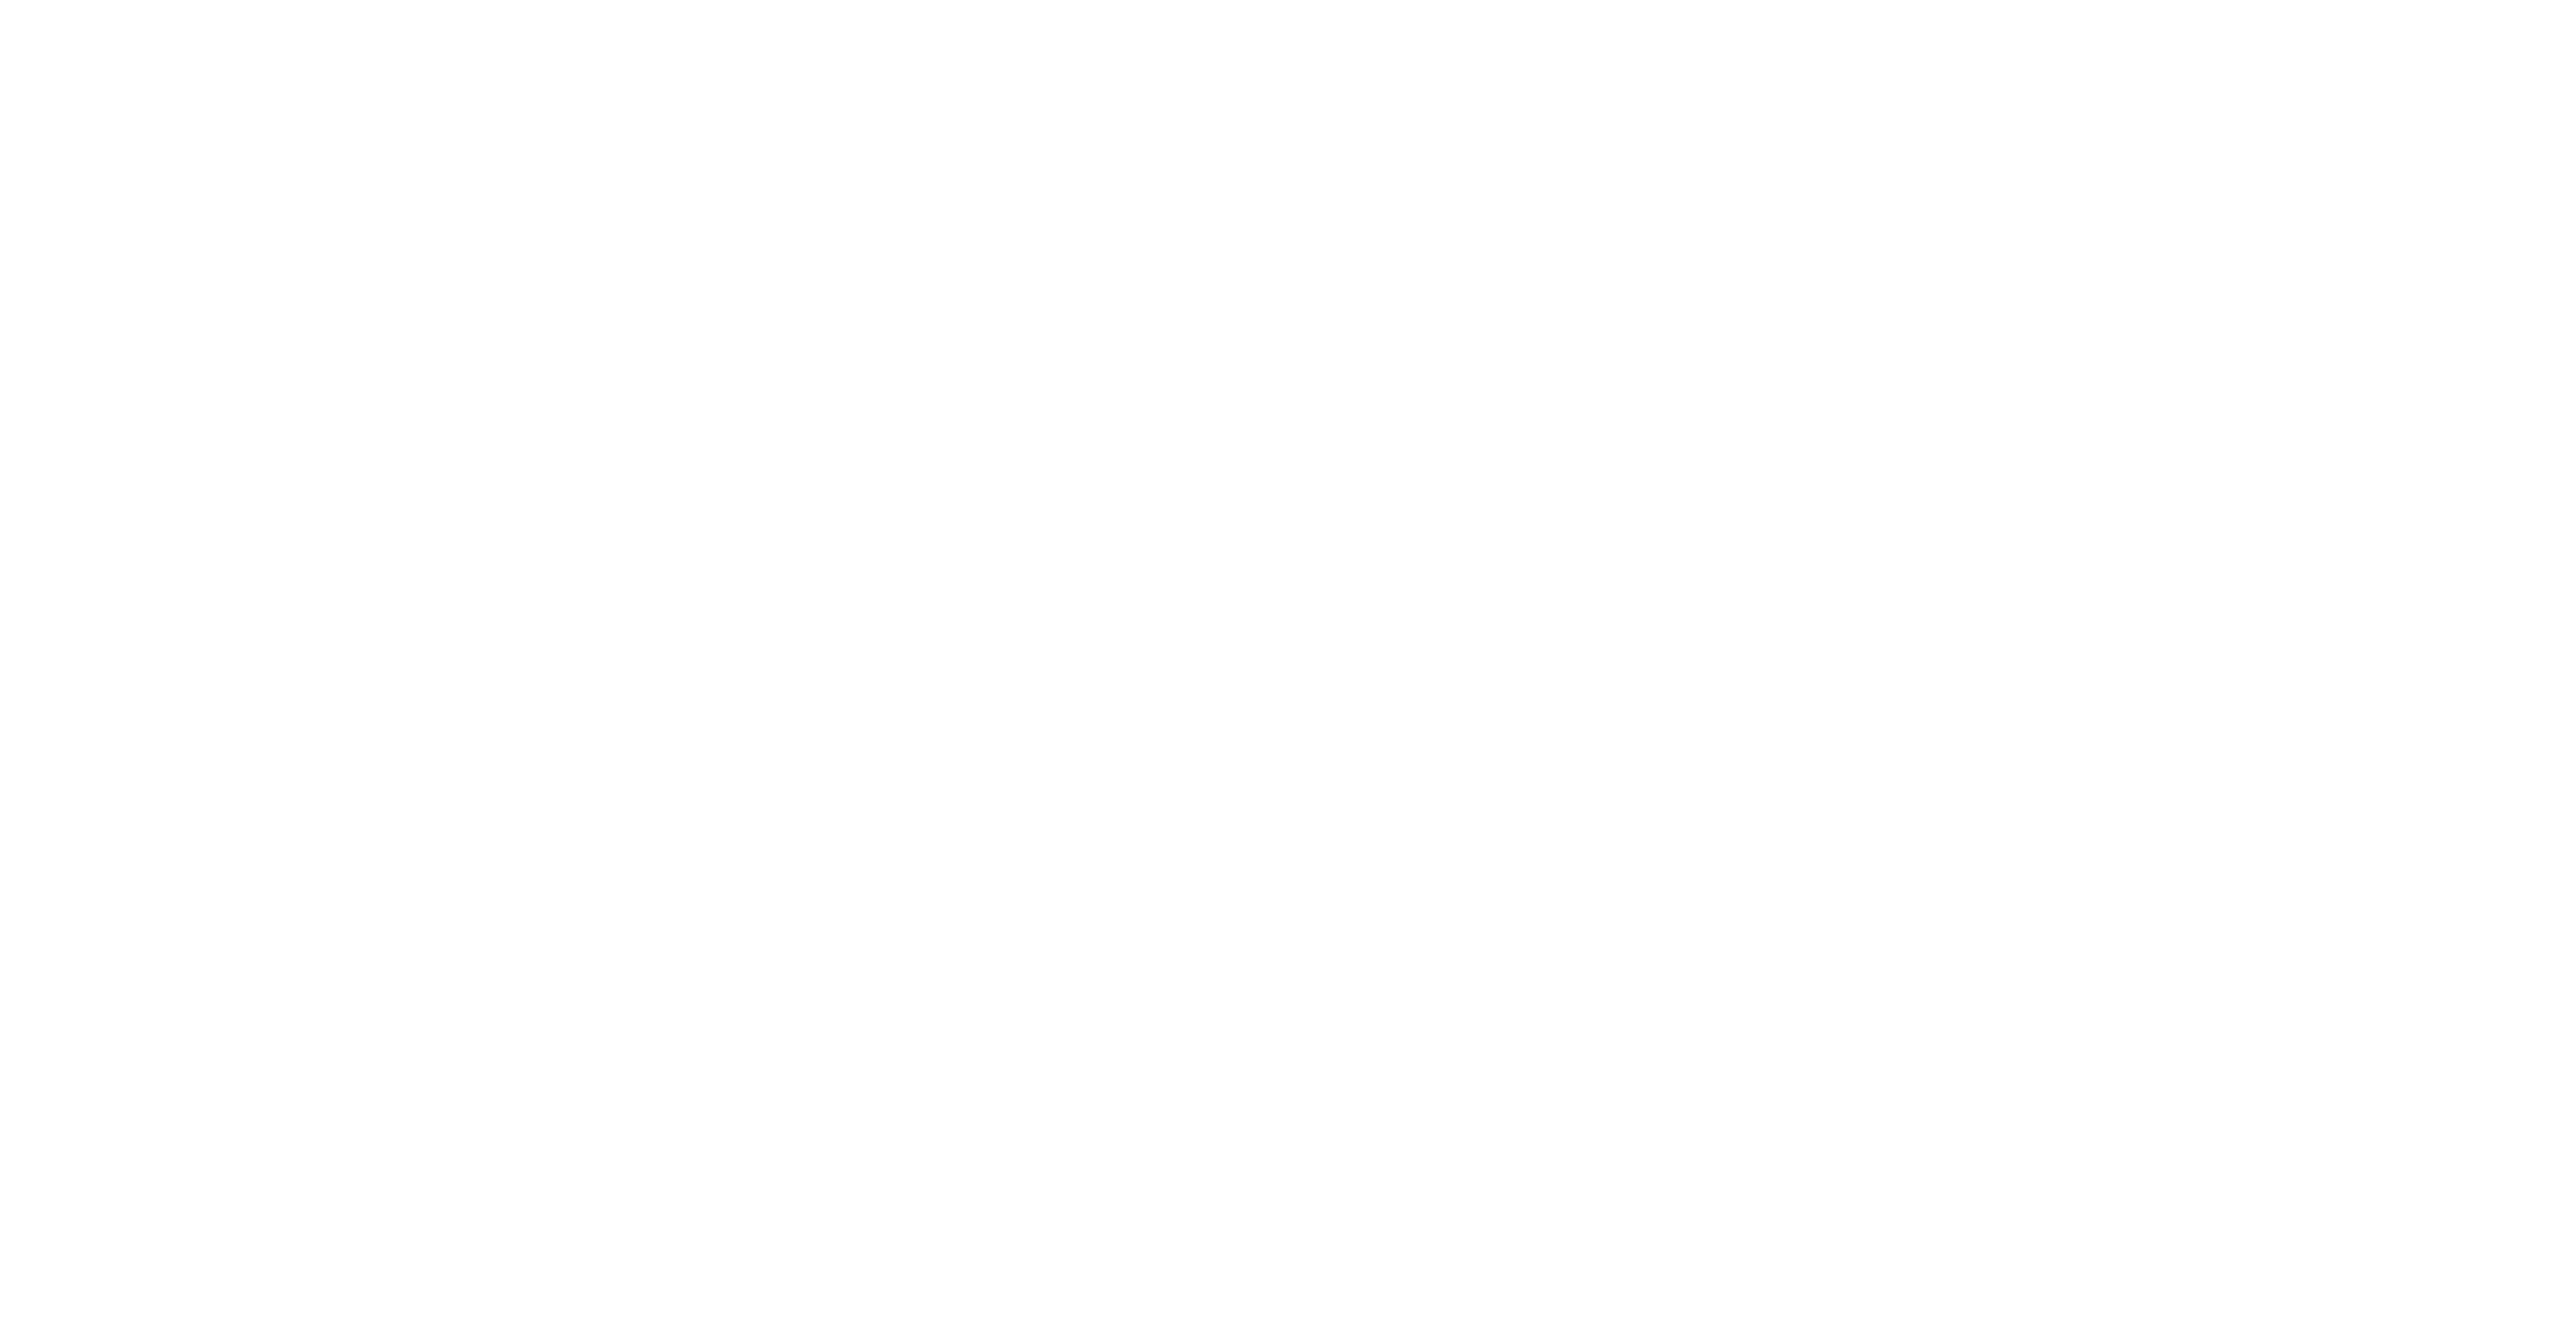 M1_Logo_2016_high-res_white